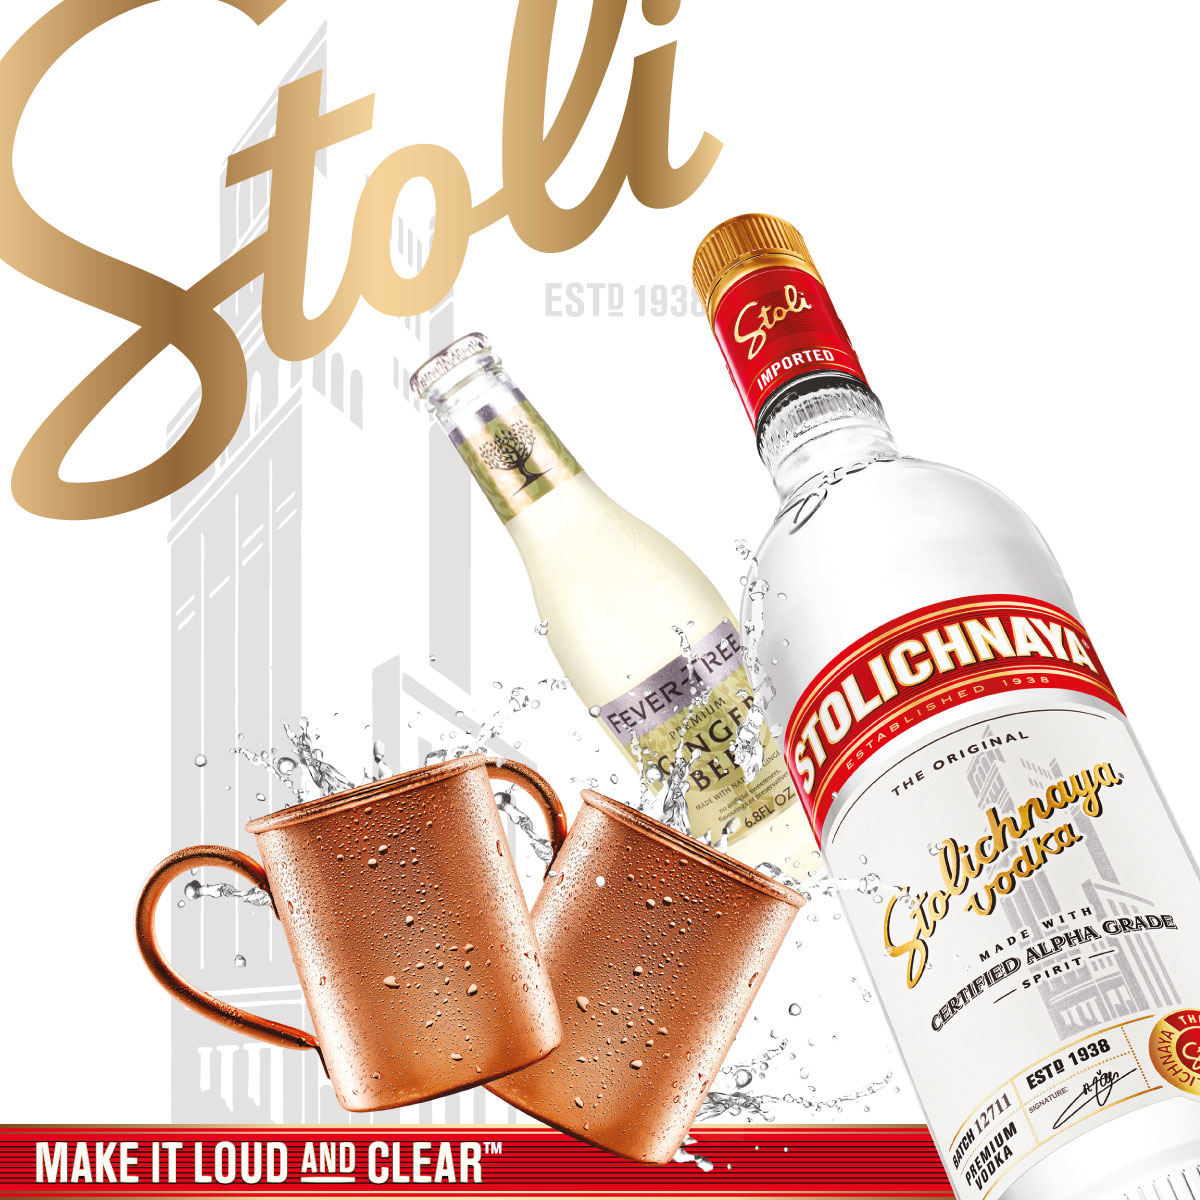 MyStoli.gr Φιάλη Stoli Premium Vodka με δώρο 2 Mugs